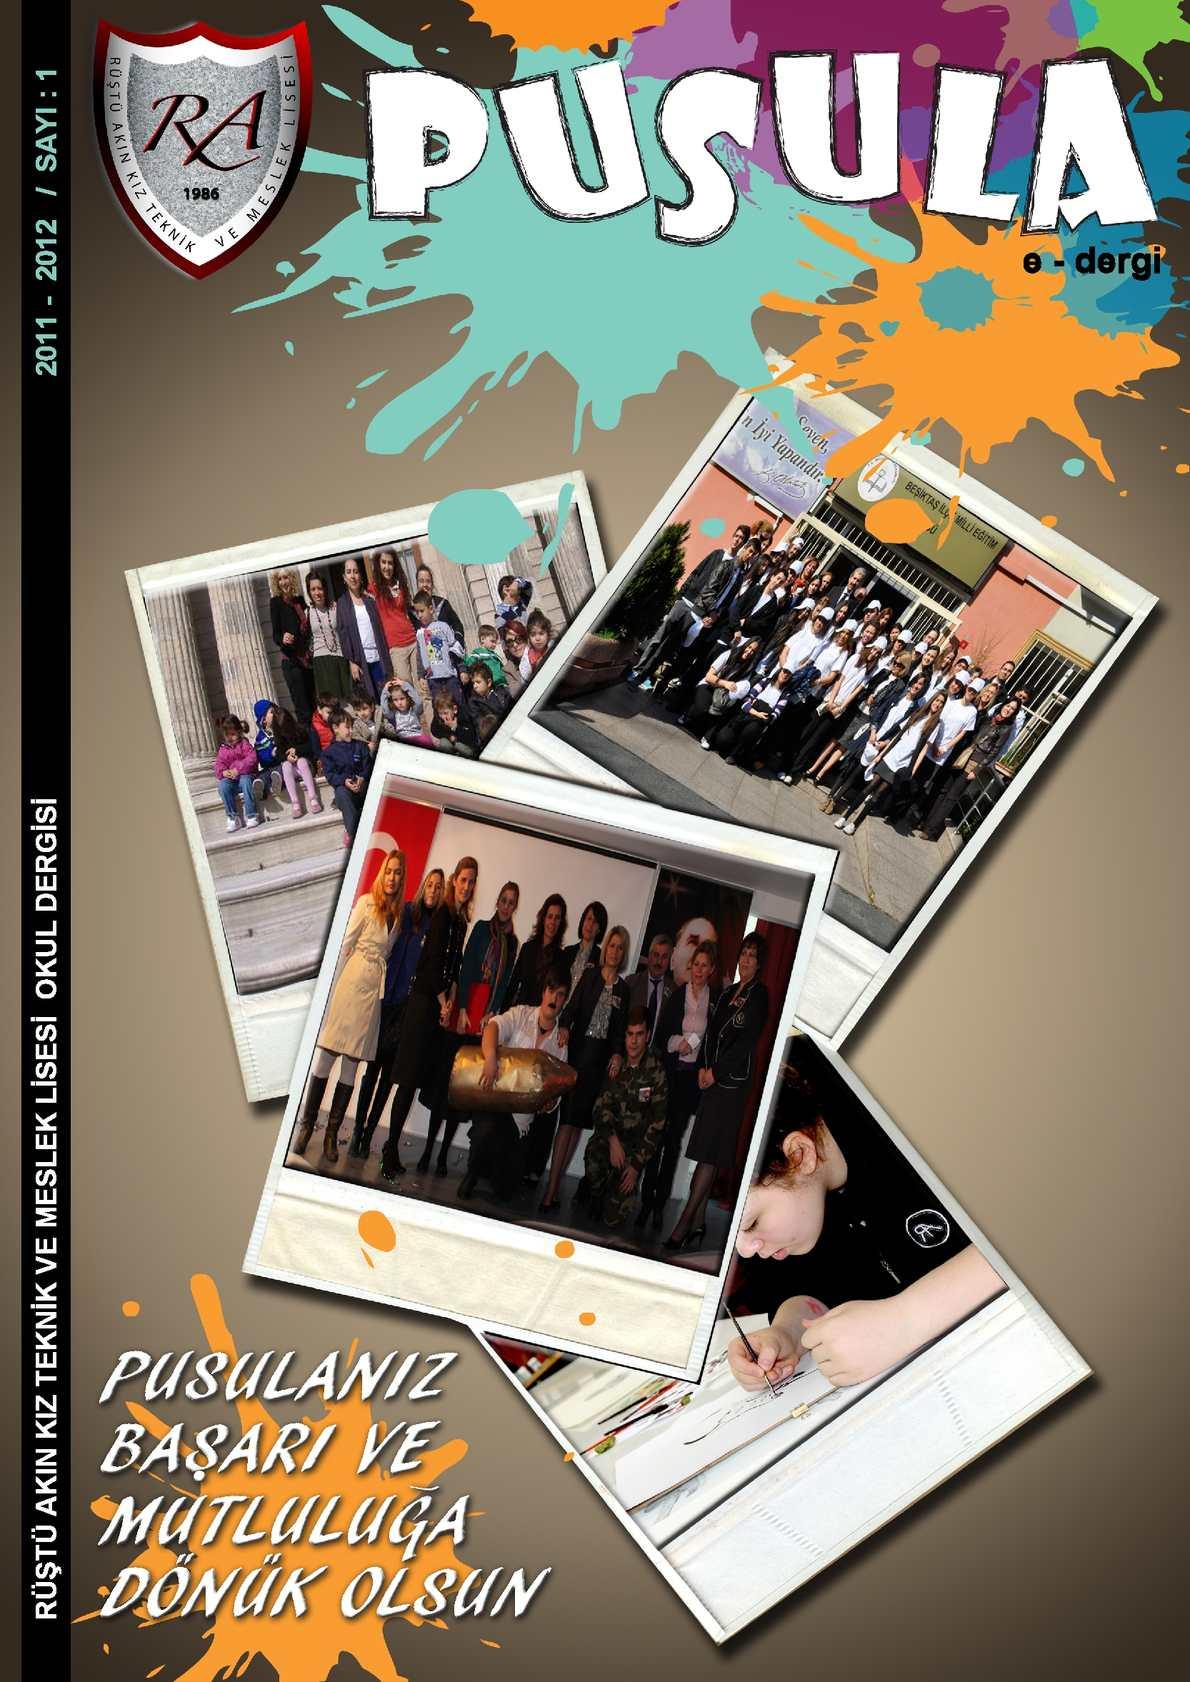 Calameo Rustu Akin Kiz Teknik Ve Meslek Lisesi E Dergi 2011 2012